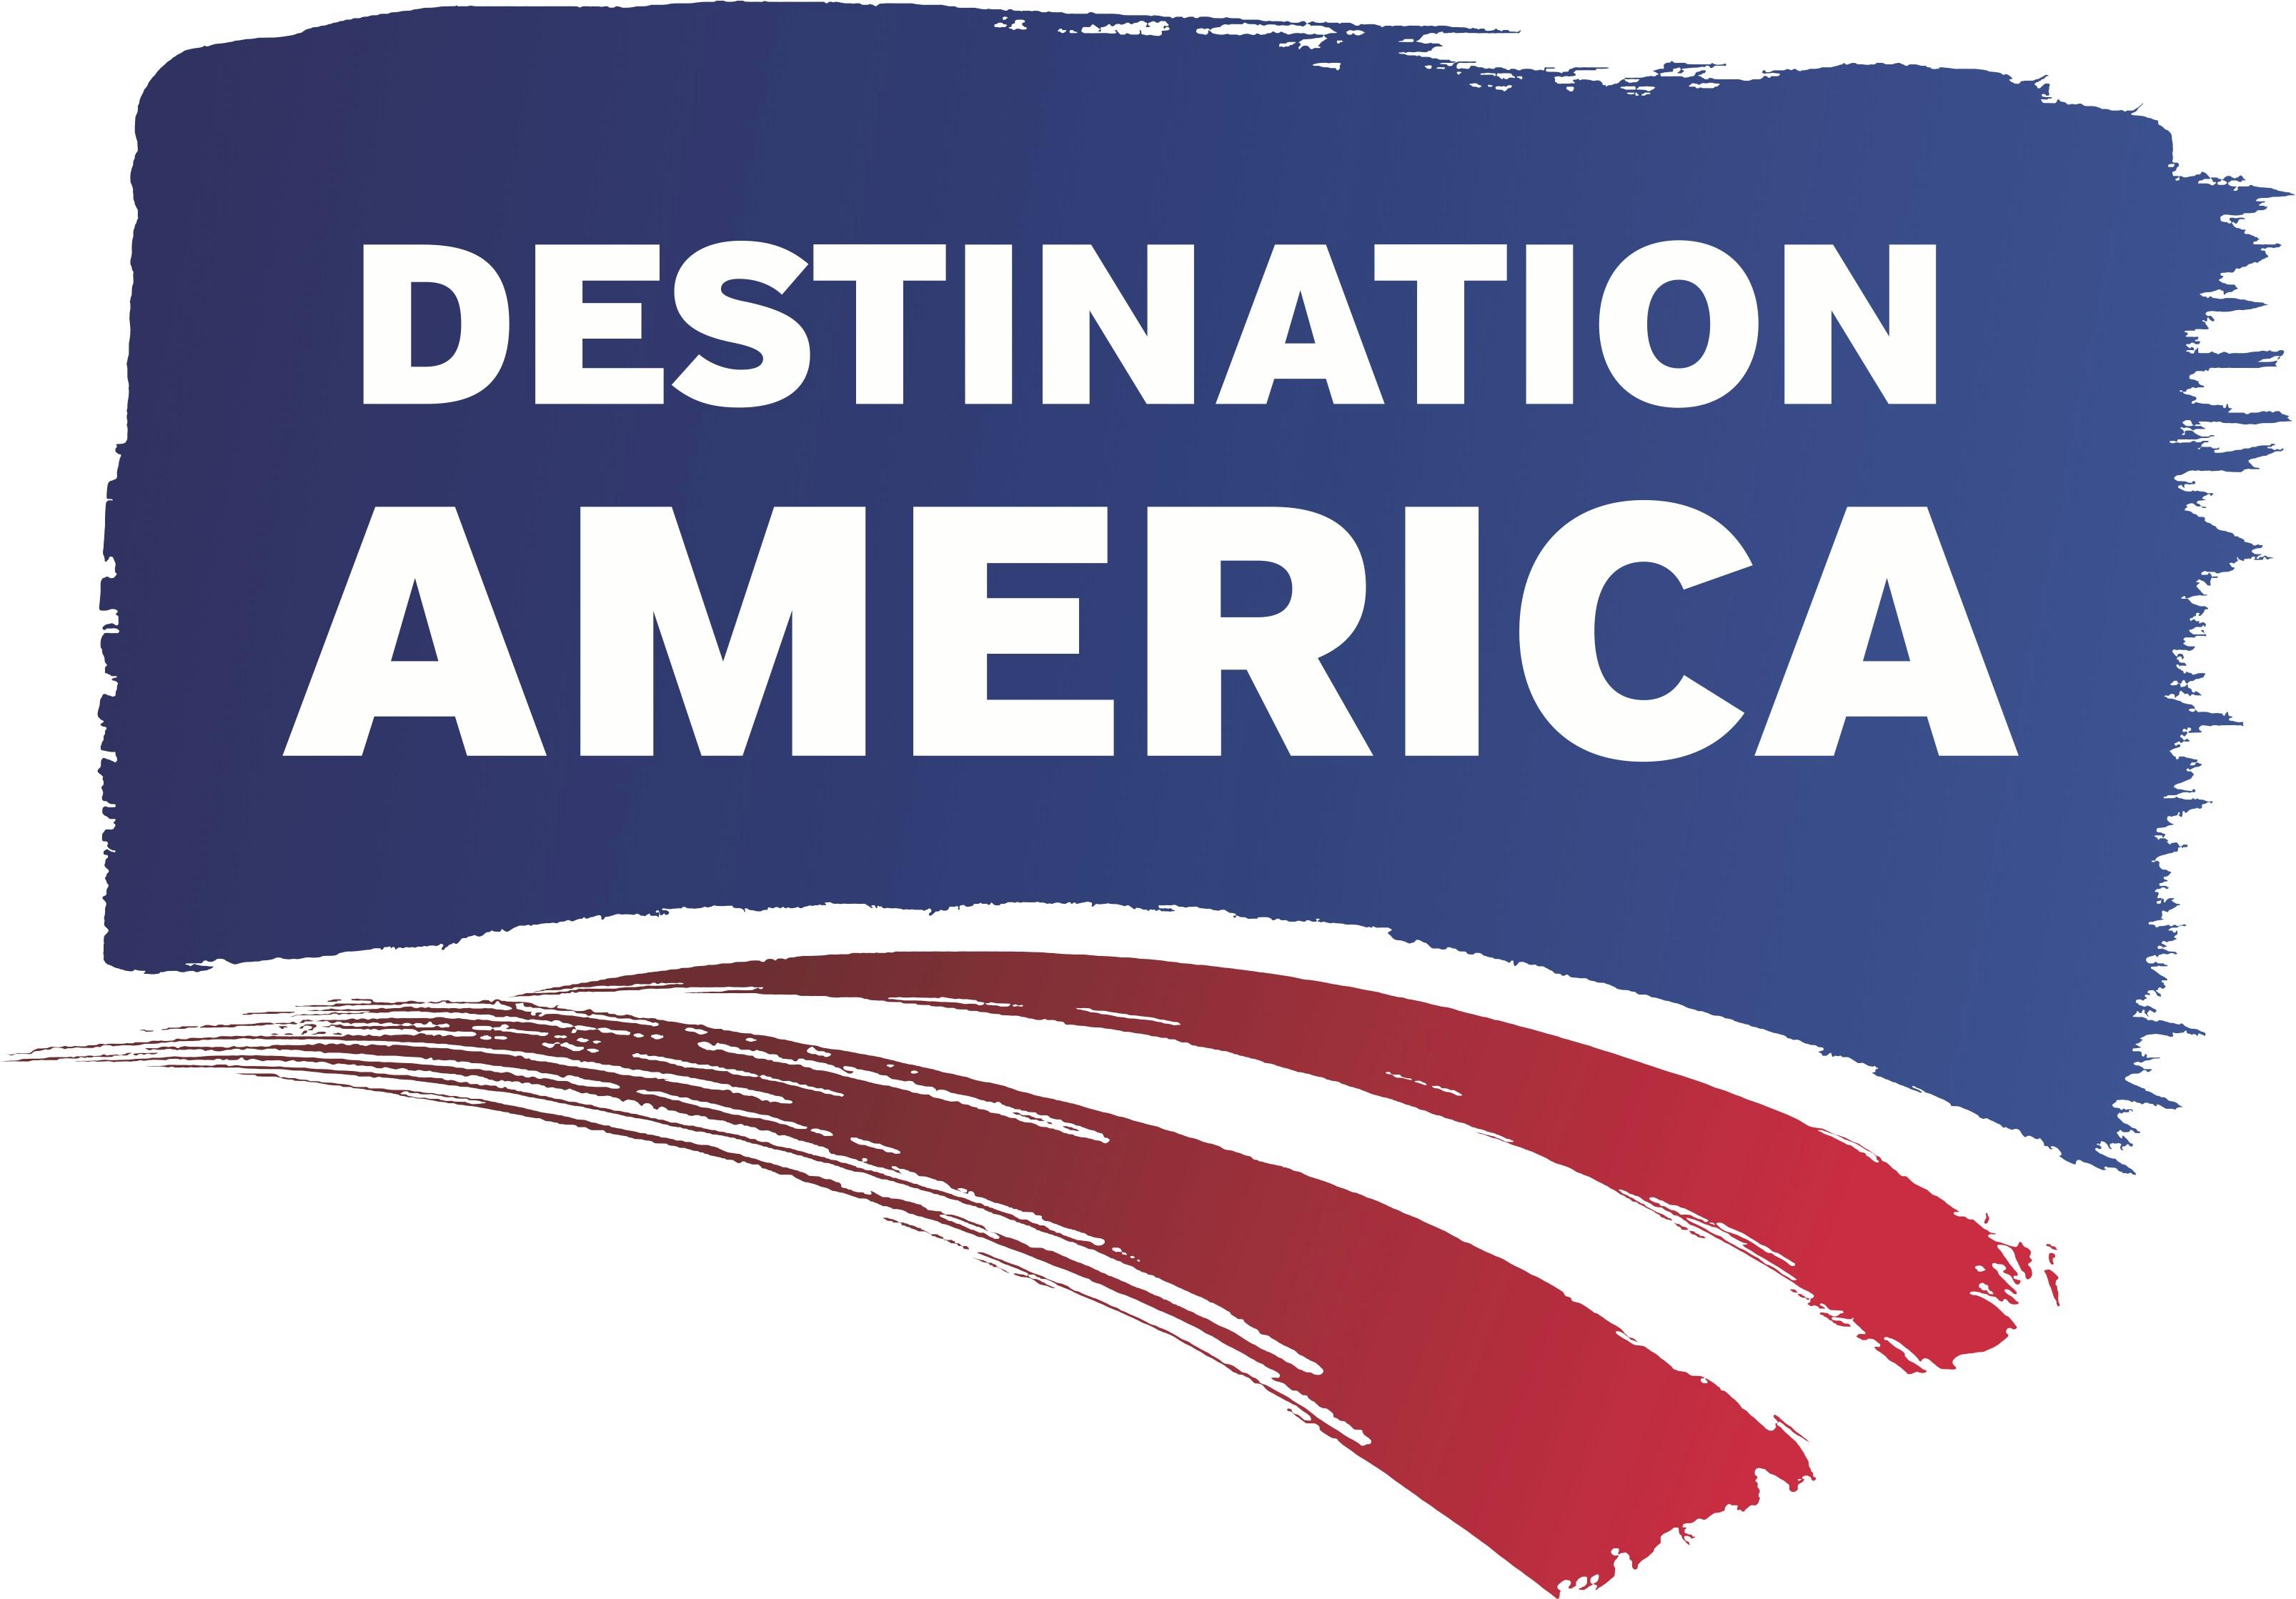 Destination America Channel Logo